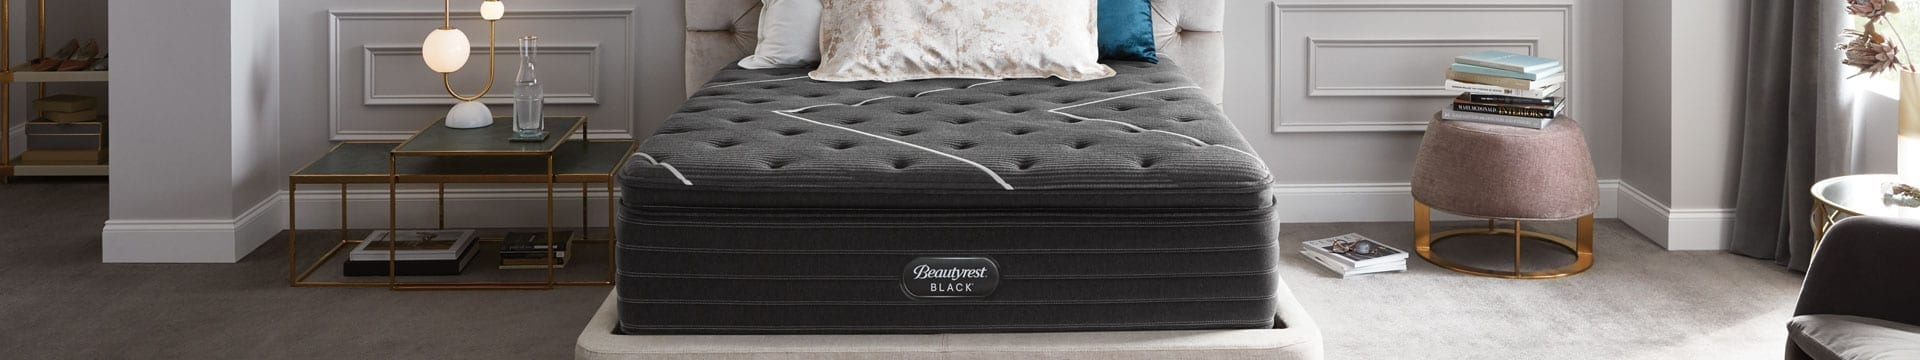 Beautyrest Black mattress in a designer bedroom